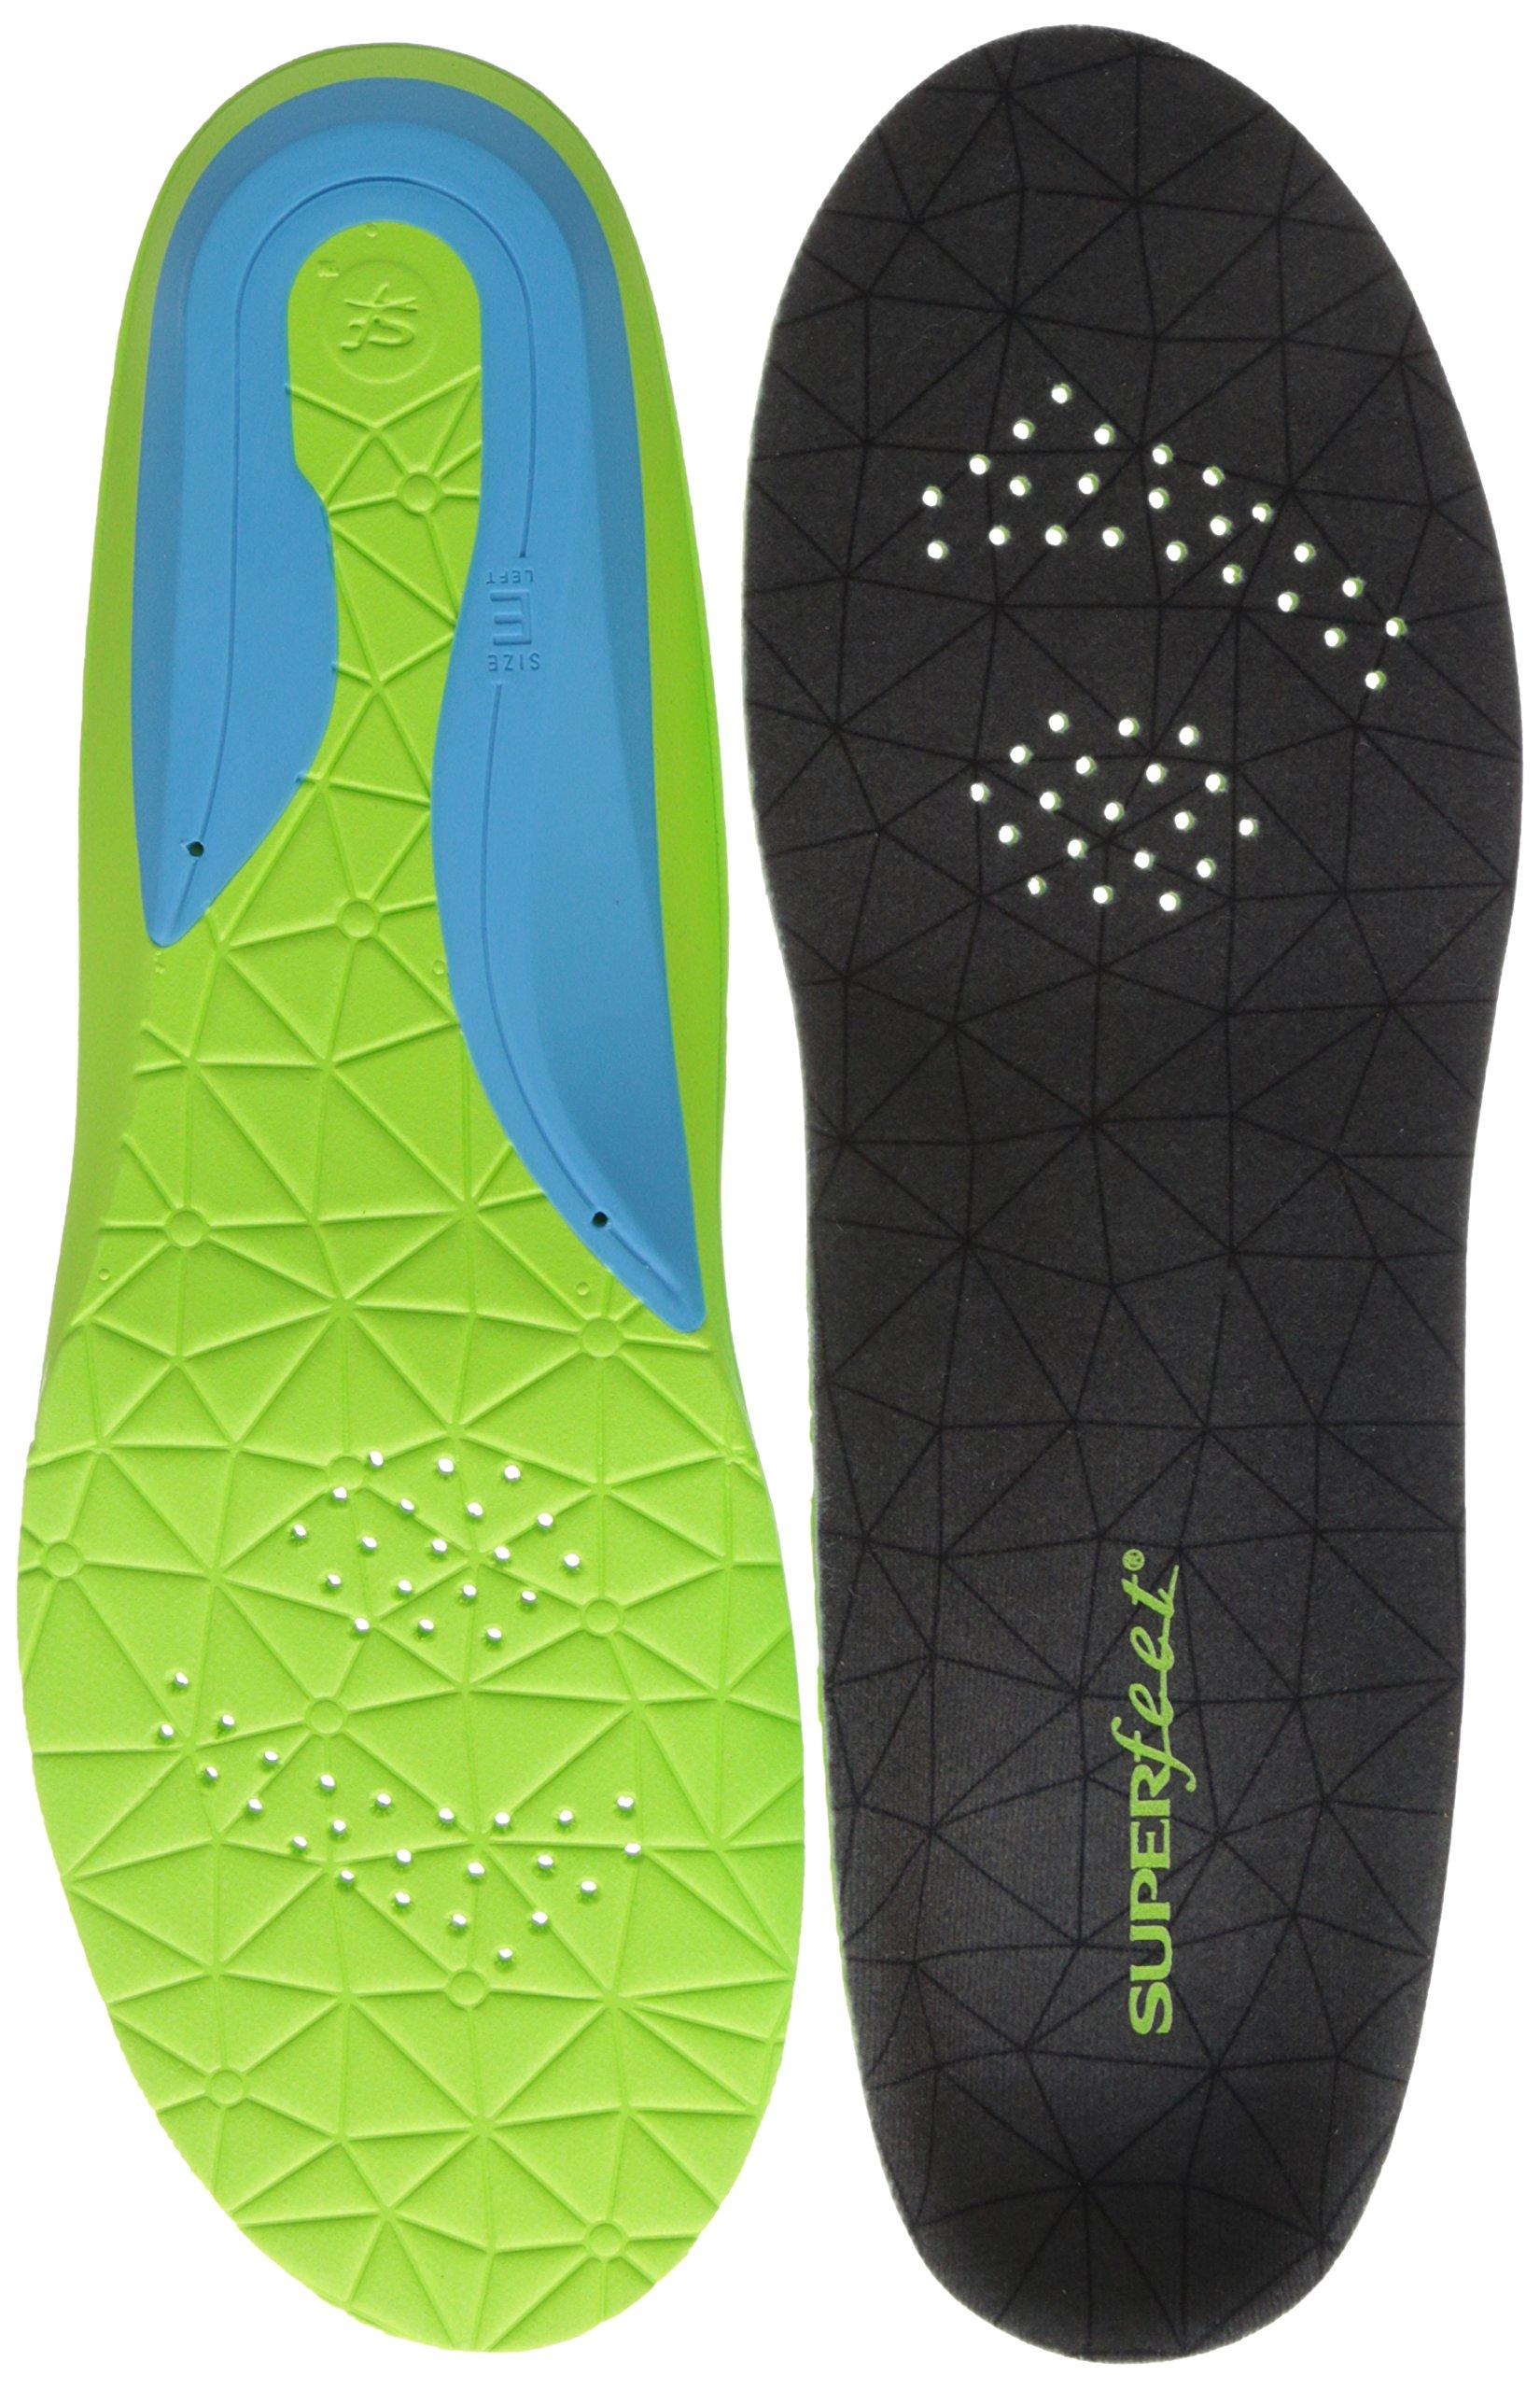 Superfeet Flexmax Athletic Comfort Shoe Insoles, Emerald, Large/10.5-12 Women's/9.5-11 Men's M US